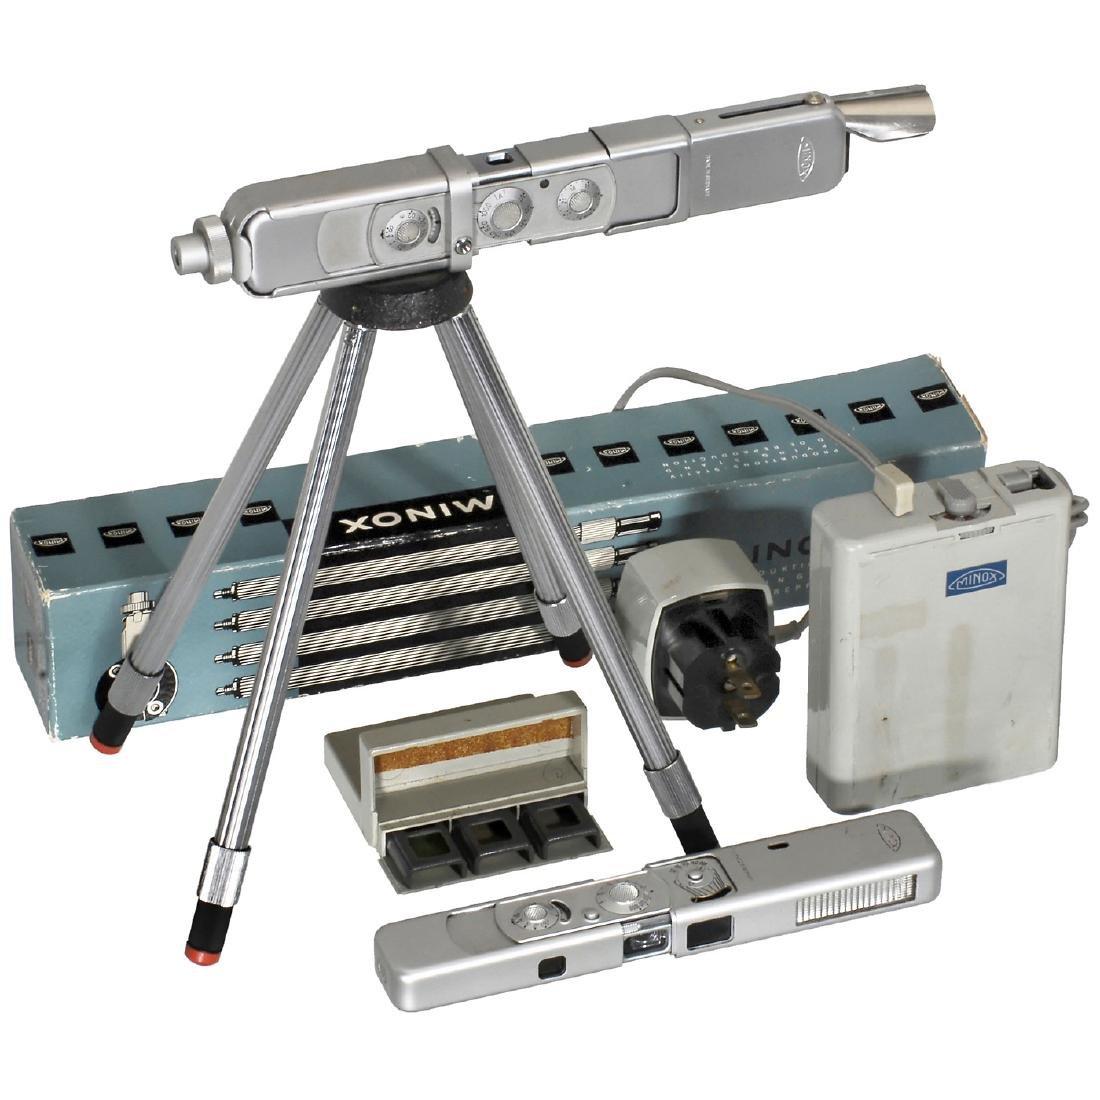 4 Minox Cameras and Accessories - 2